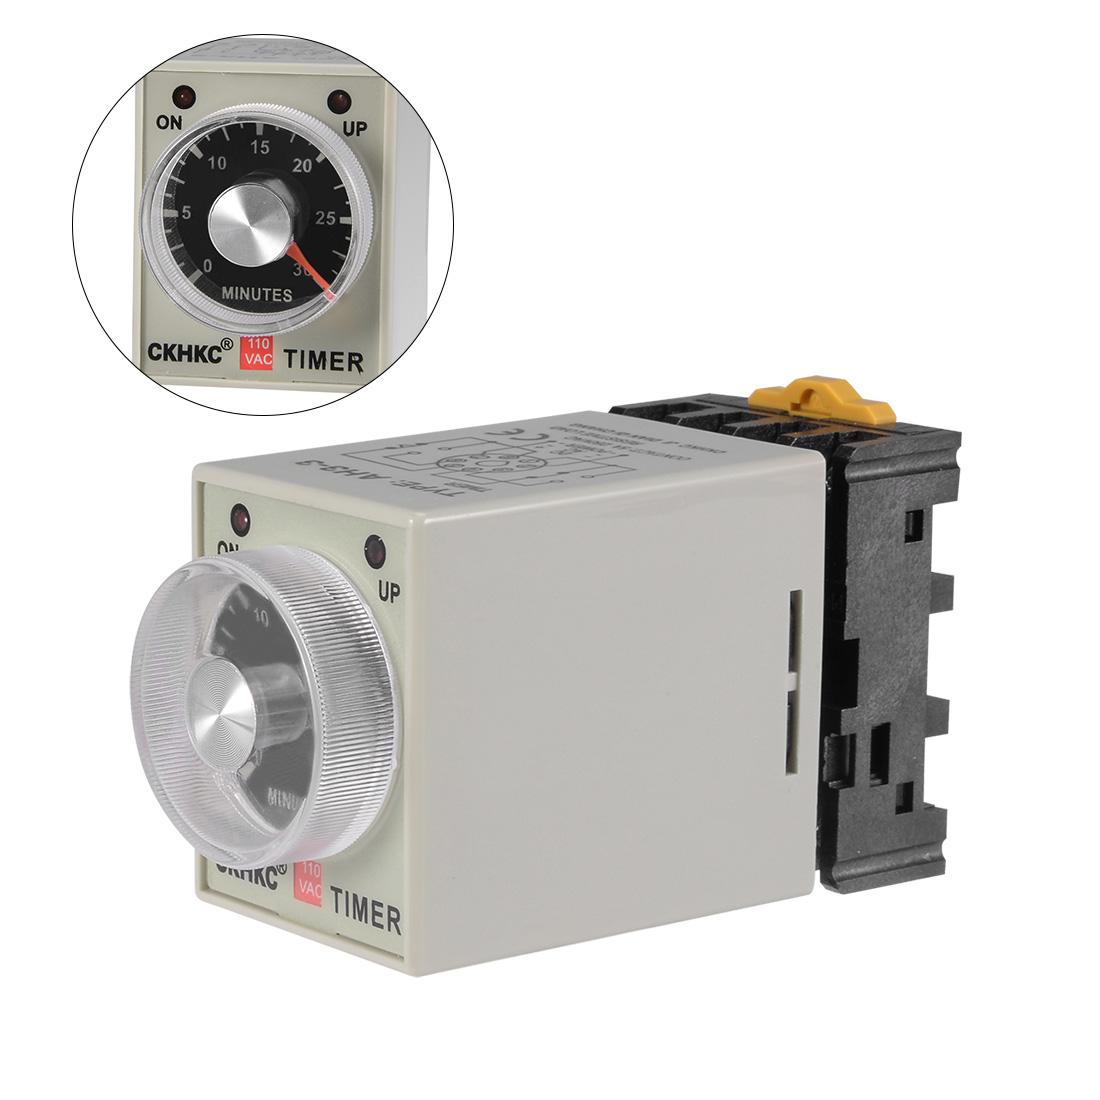 AC110V 30M 8 Terminals Range Adjustable Delay Timer Time Relay AH3-3 w base3